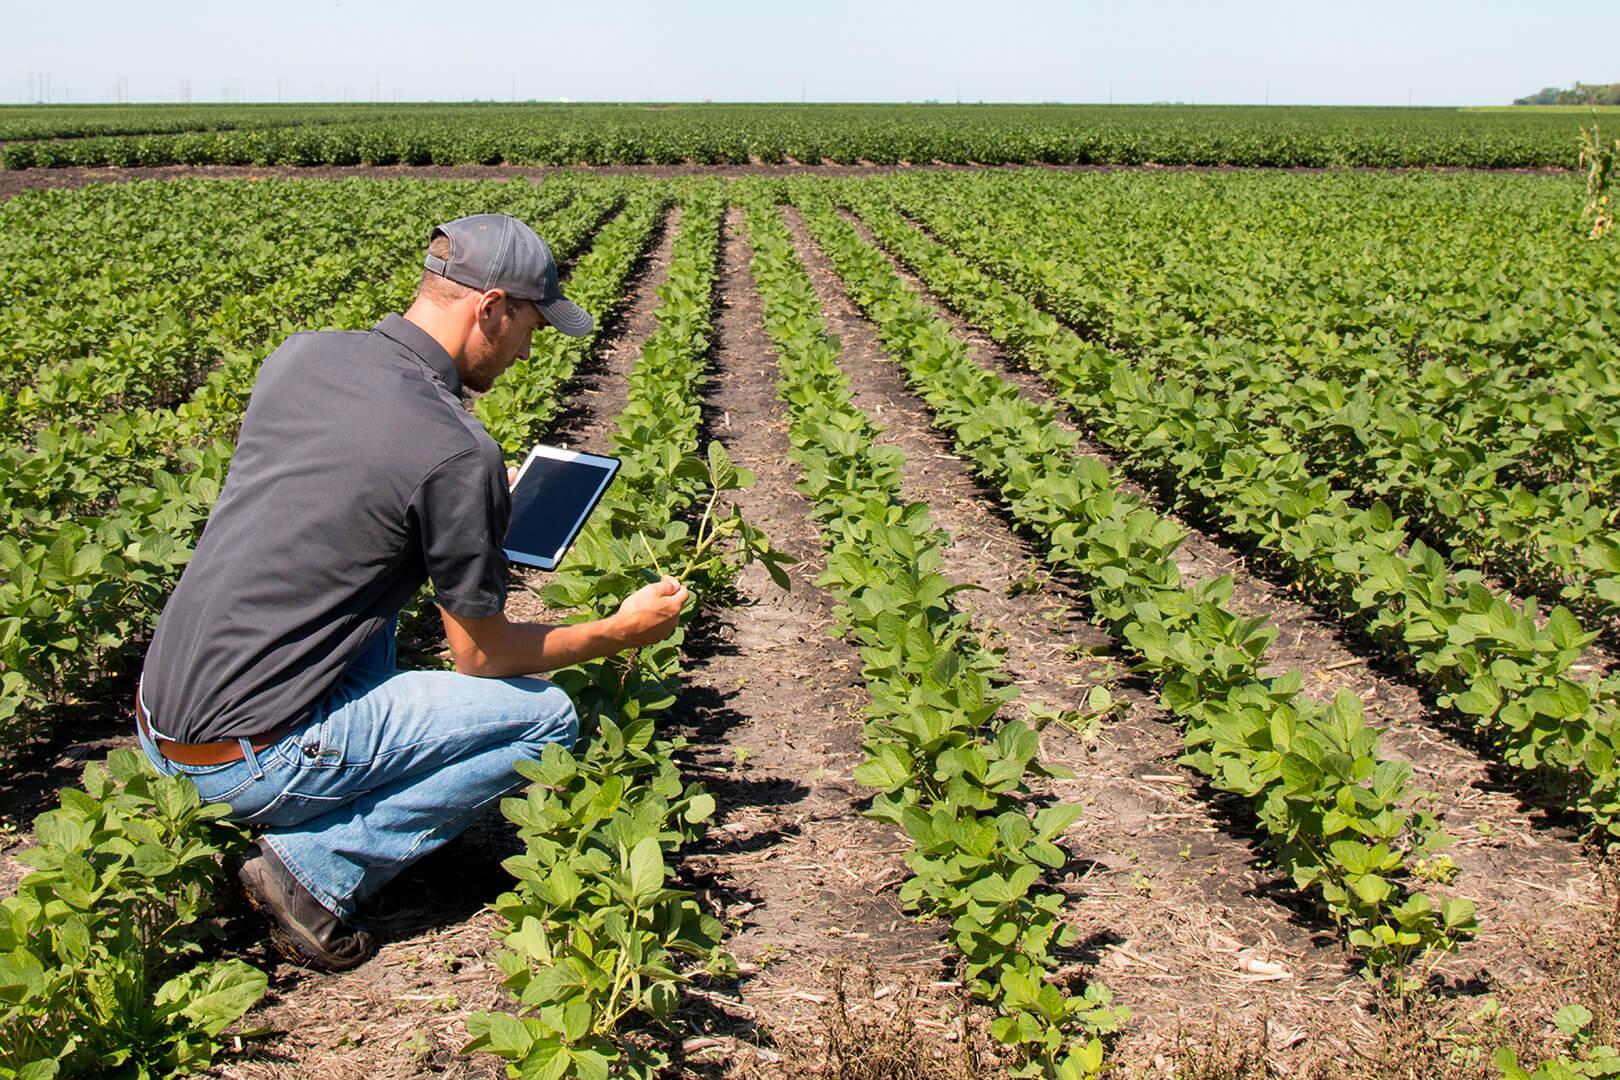 Farmer with tablet kneeling in field to inspect crop